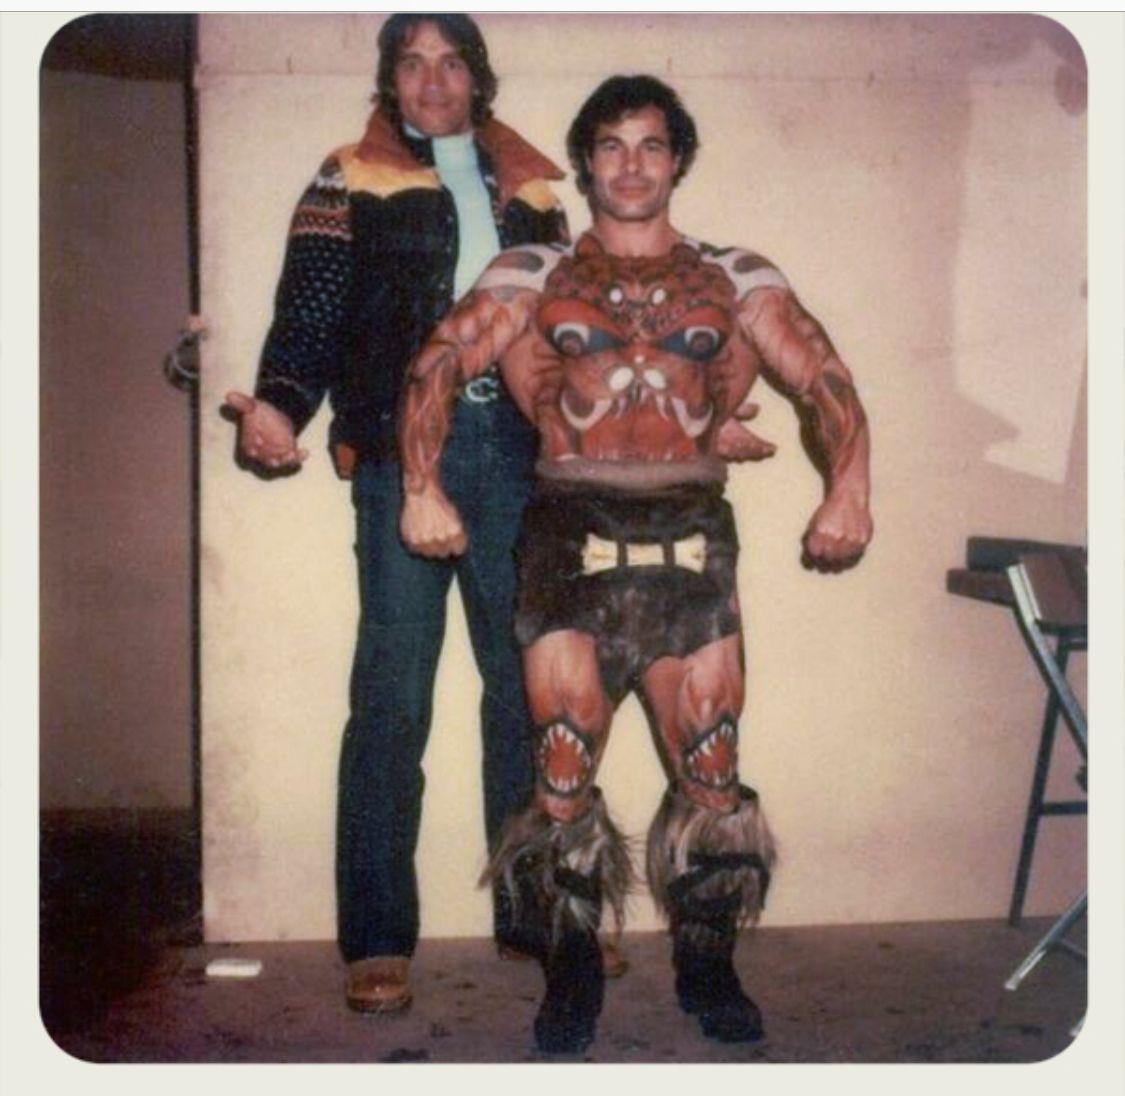 Pin By Melvin Lead On Sci Fi Fantasy Arnold Movies Conan The Barbarian 1982 Conan The Barbarian